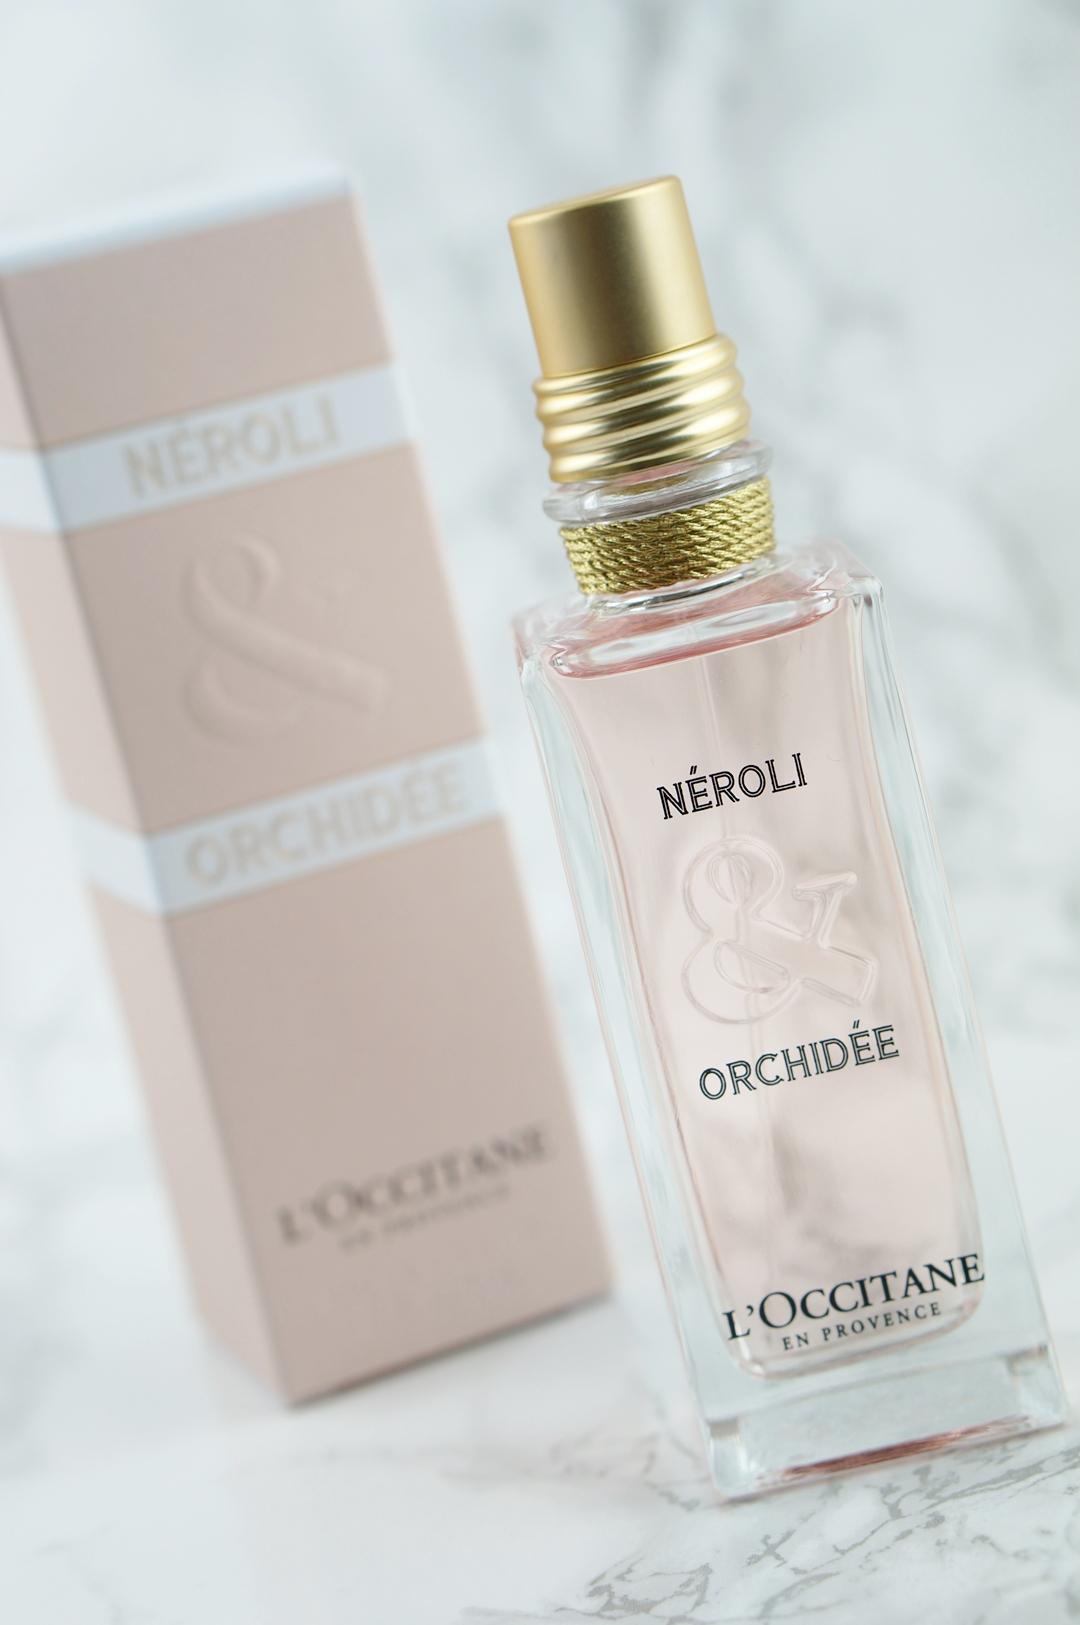 L'Occitane Néroli & Orchidée